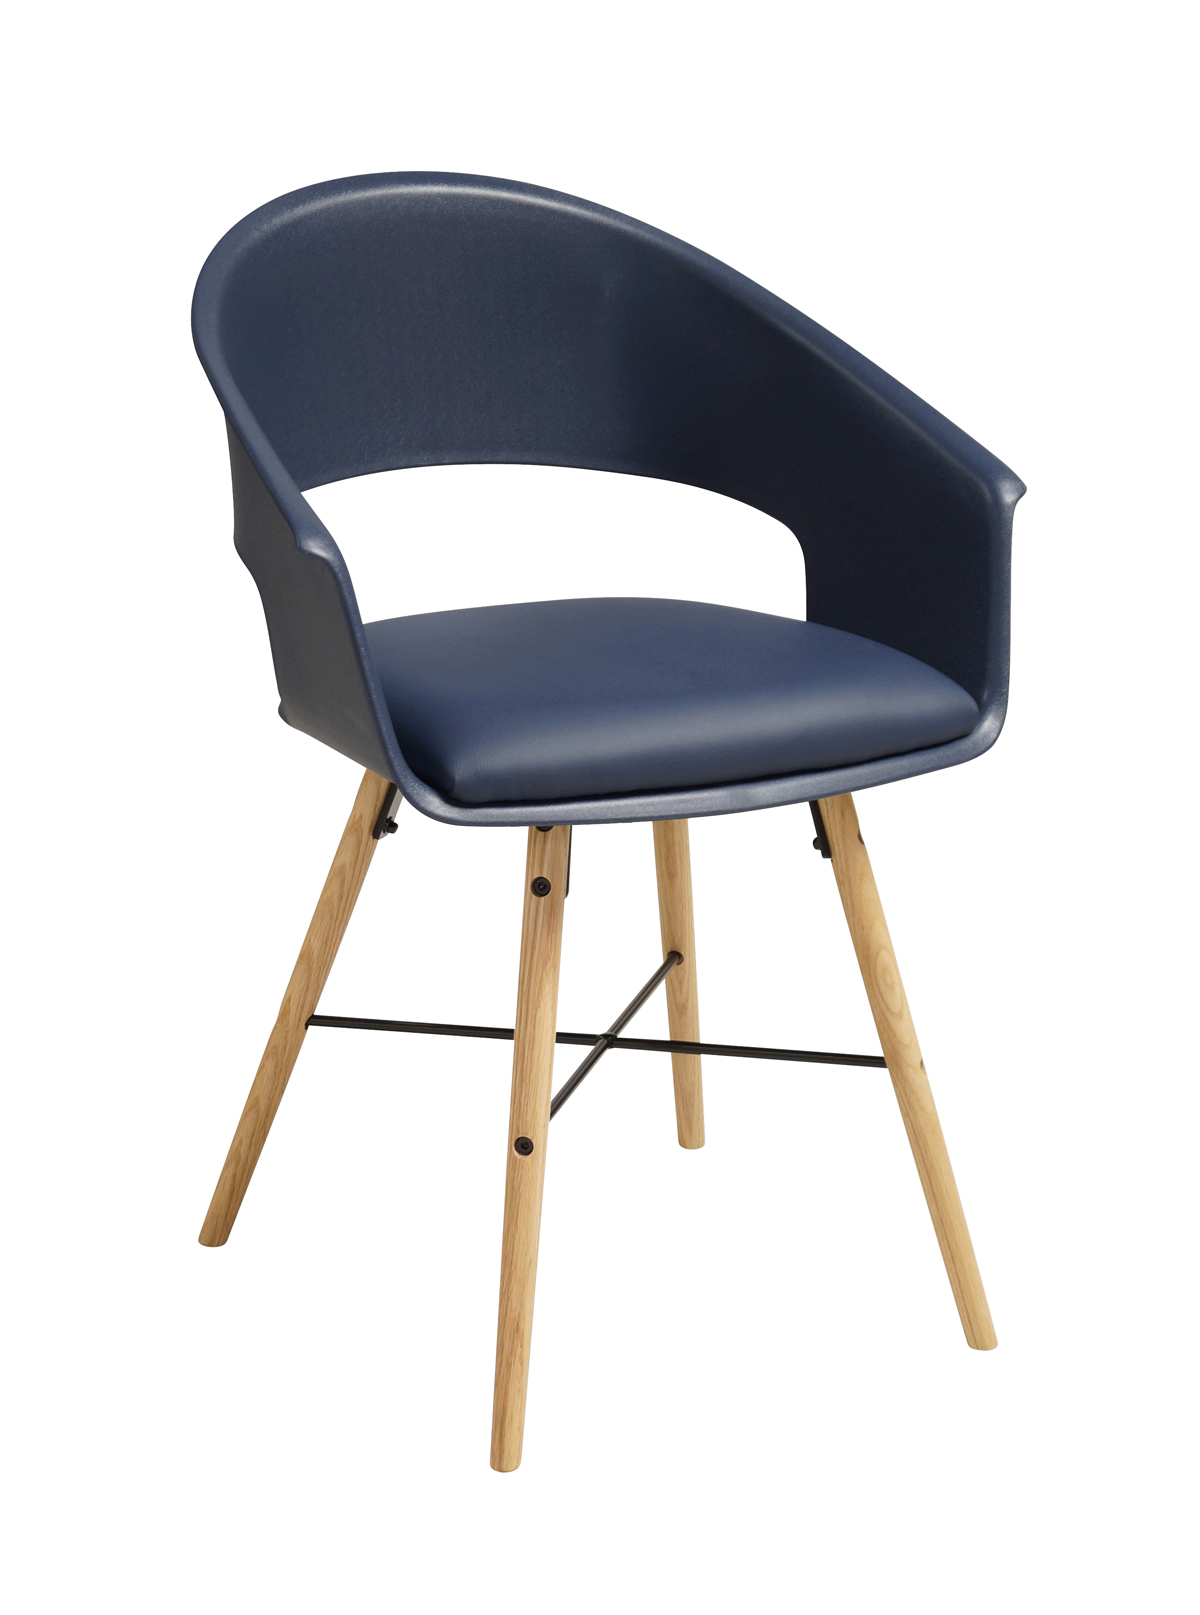 Ivar 10 Spisebordsstol m. insignia blue sæde - Natur